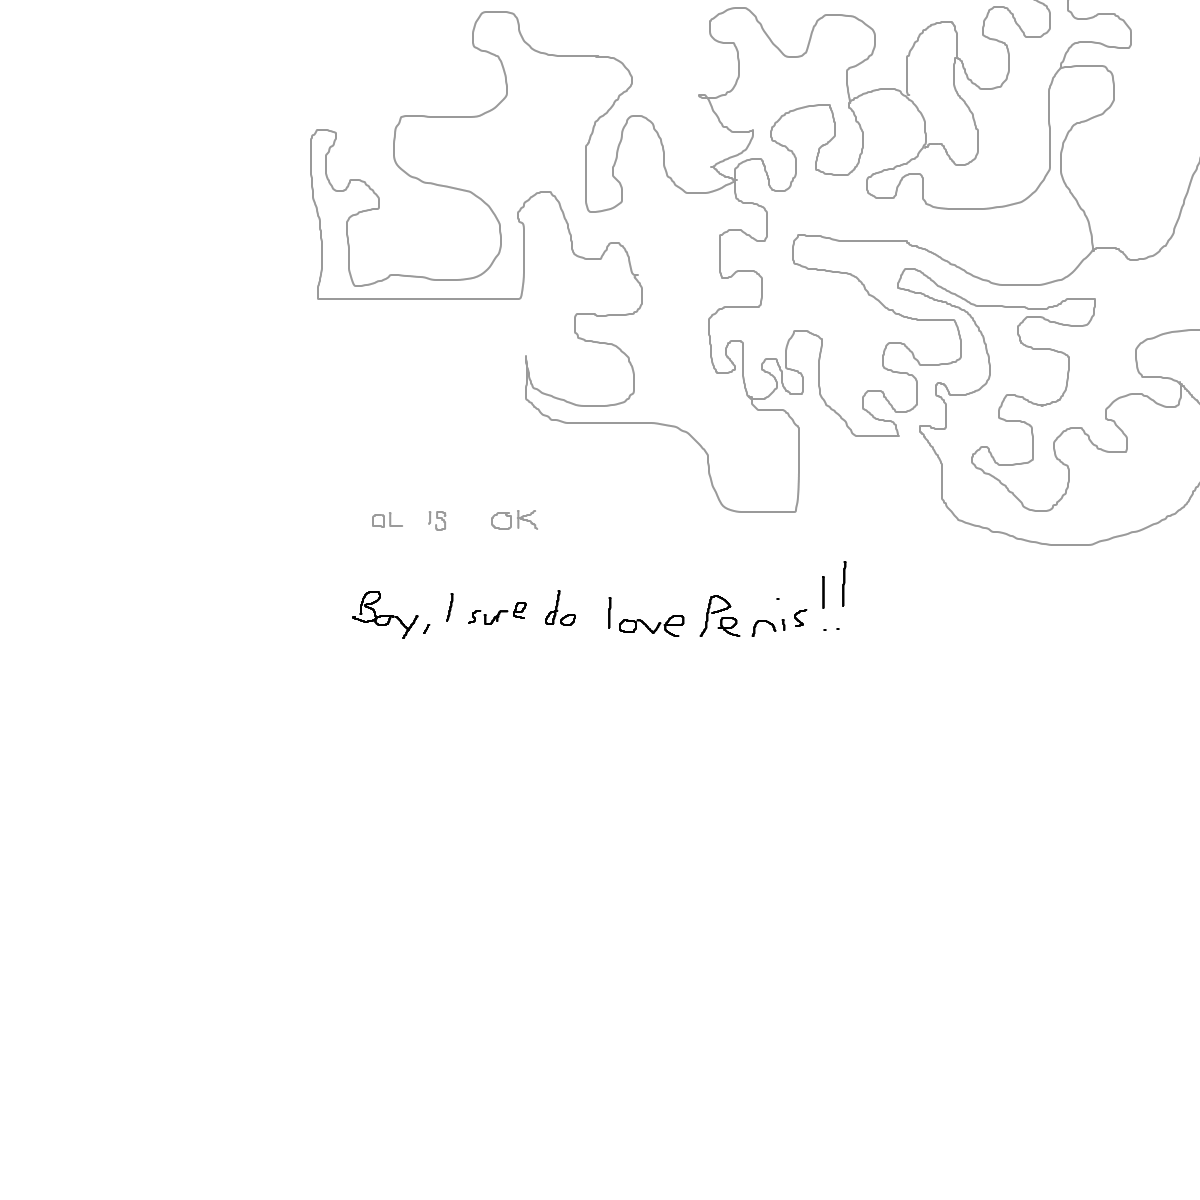 BAAAM drawing#378 lat:44.4774322509765600lng: -76.6932373046875000